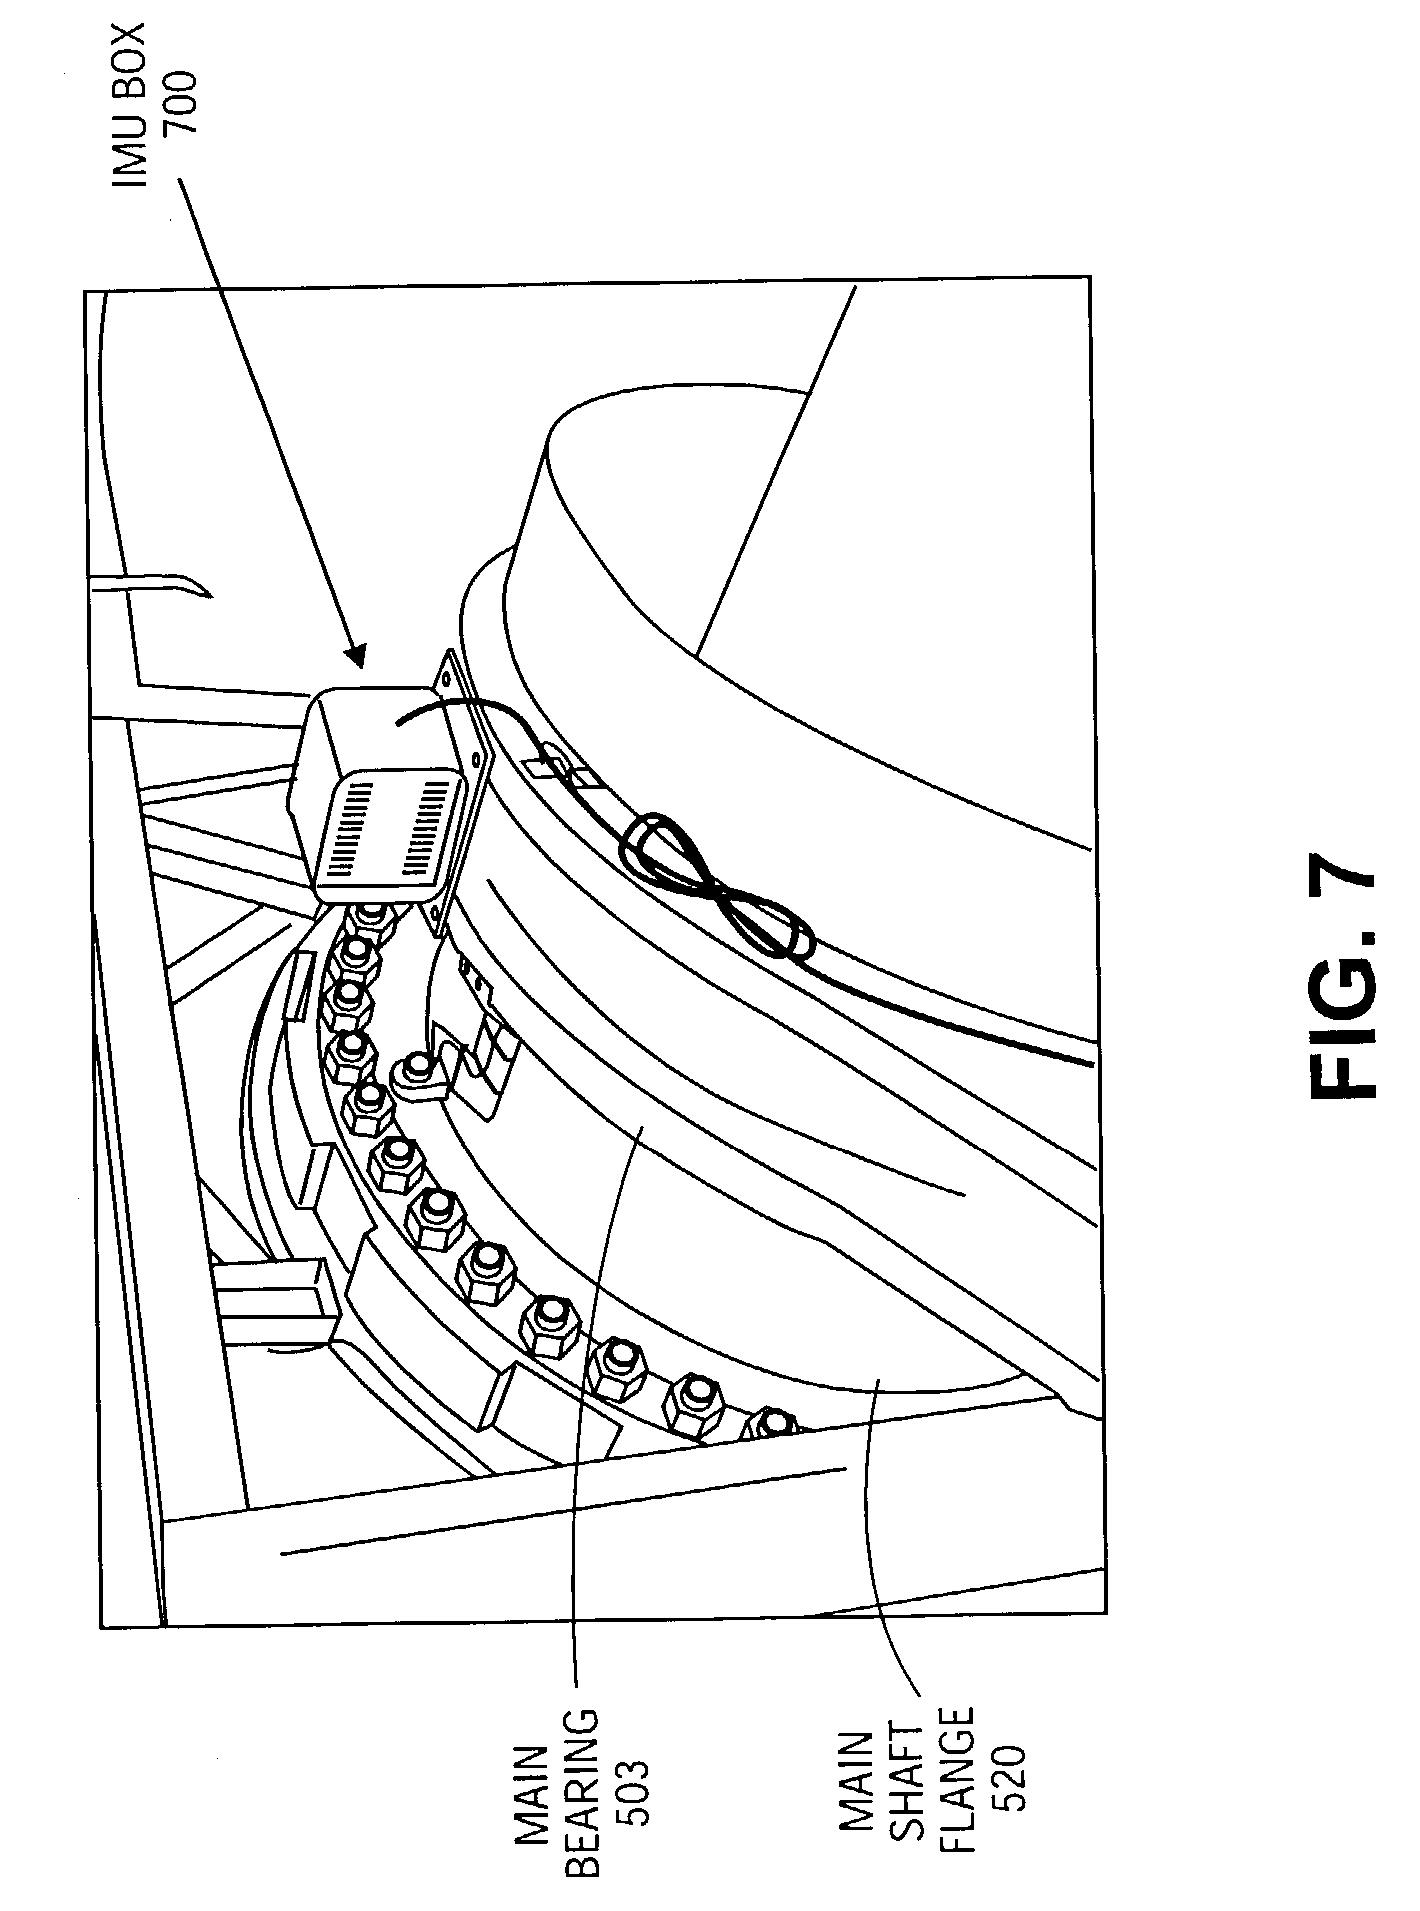 Attractive 1970 mg midget wiring diagram festooning electrical